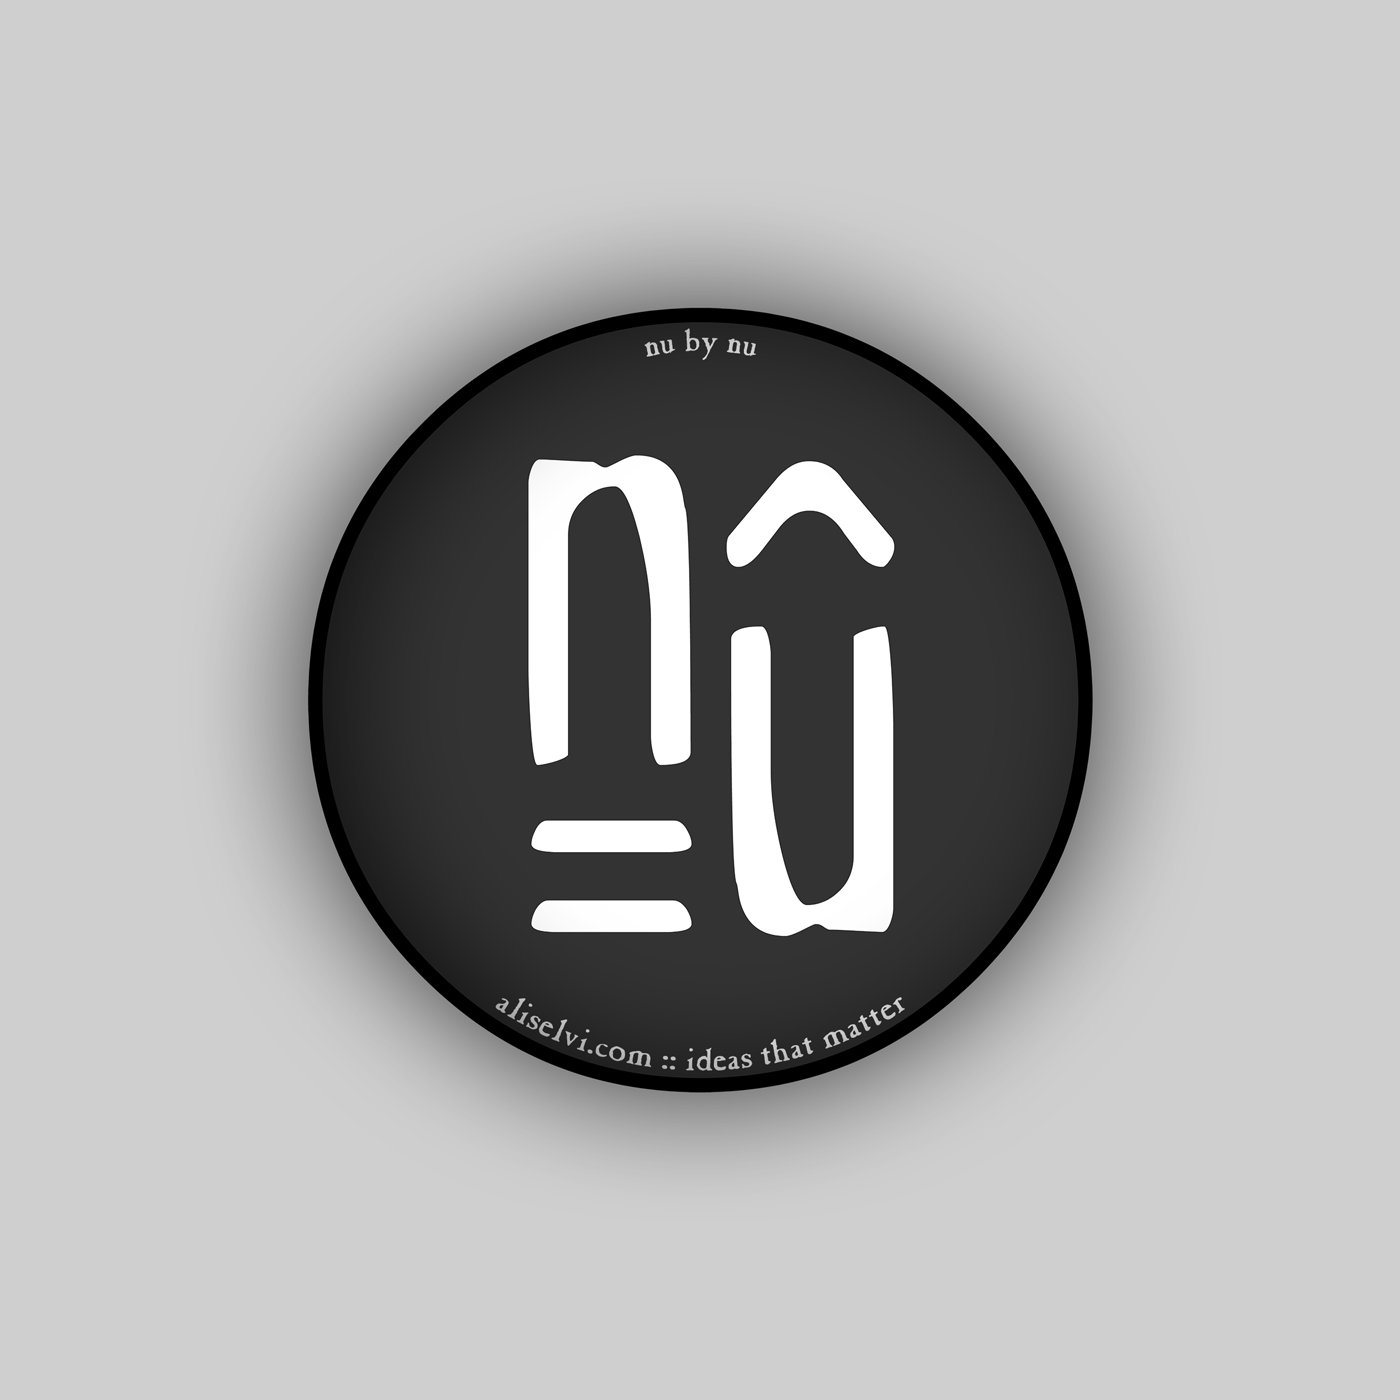 https://aliselvi.com/wp-content/uploads/2016/05/aliselvi-logo-01big1a.png